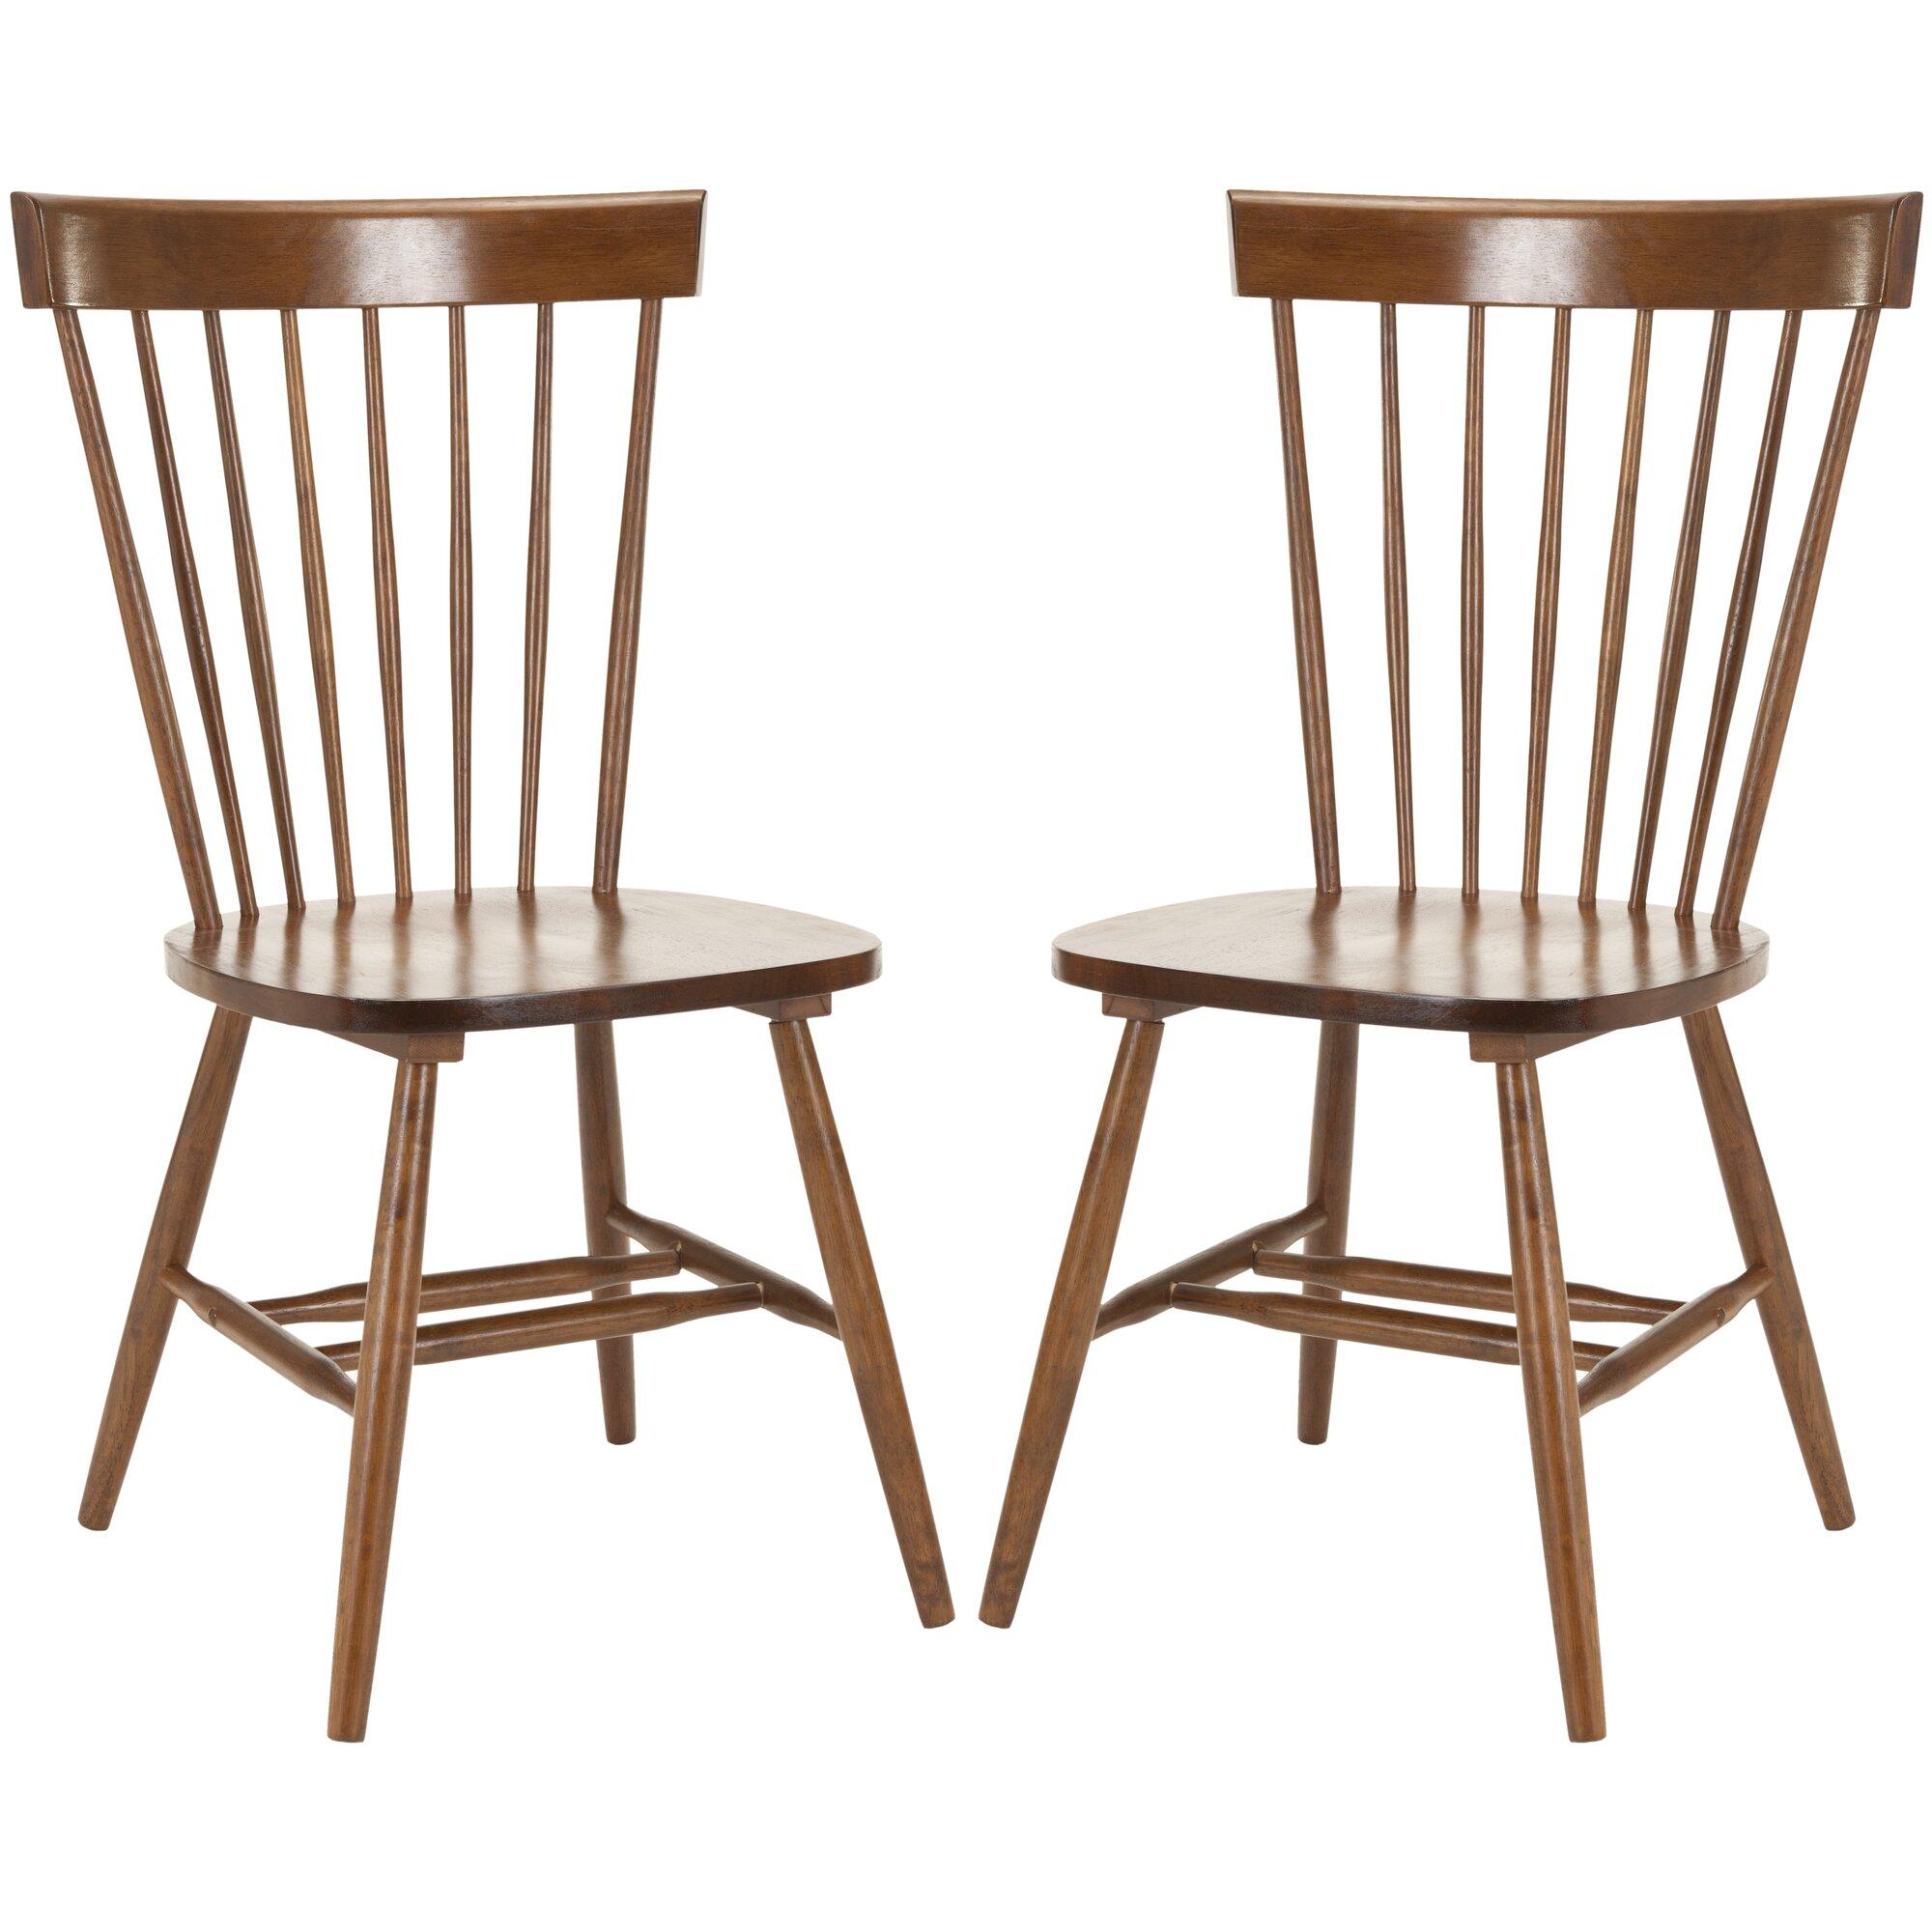 Solid Wood Dining Chairs: Lark Manor Saint-Pierre Solid Wood Dining Chair & Reviews